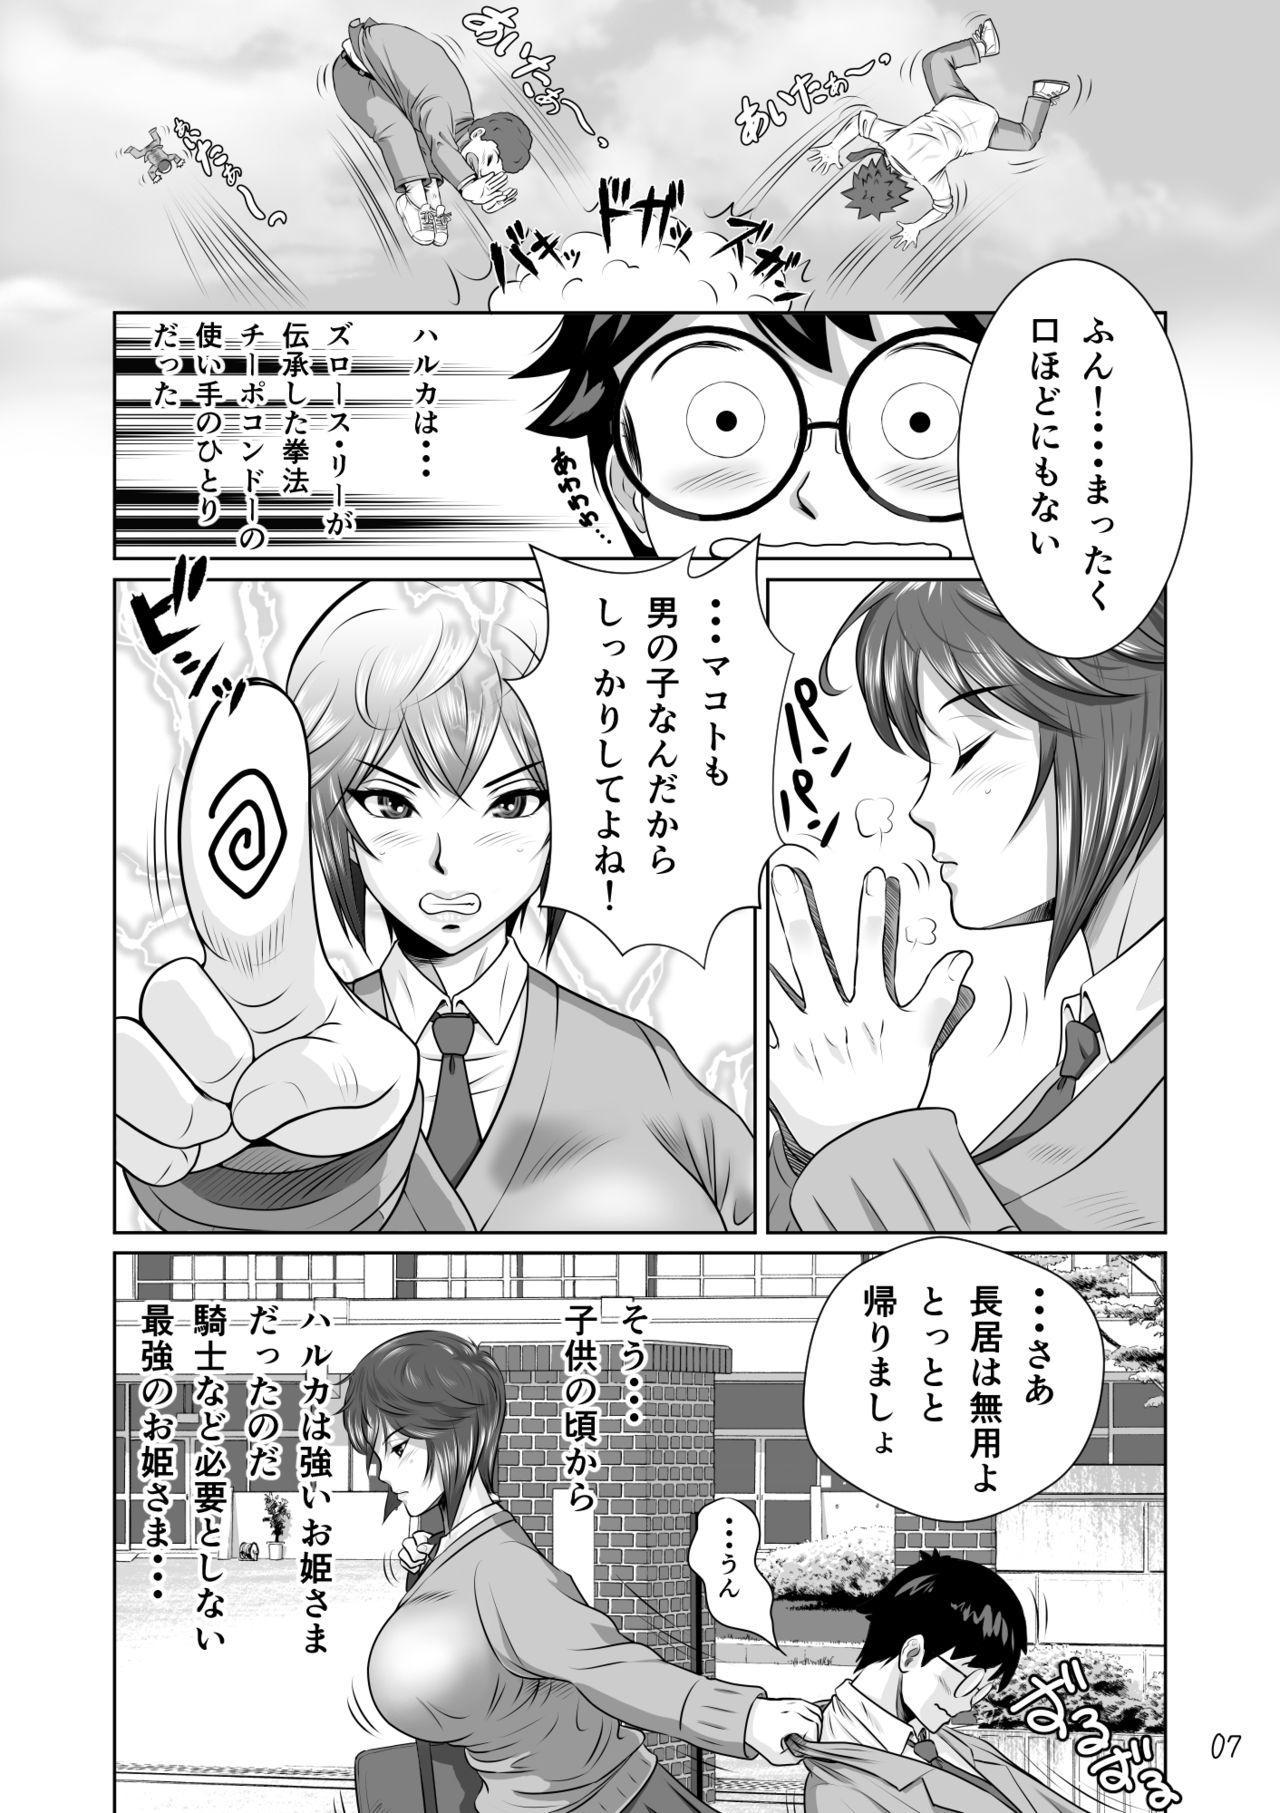 Netorare Osananajimi Haruka-chan Kiki Ippatsu!! 7